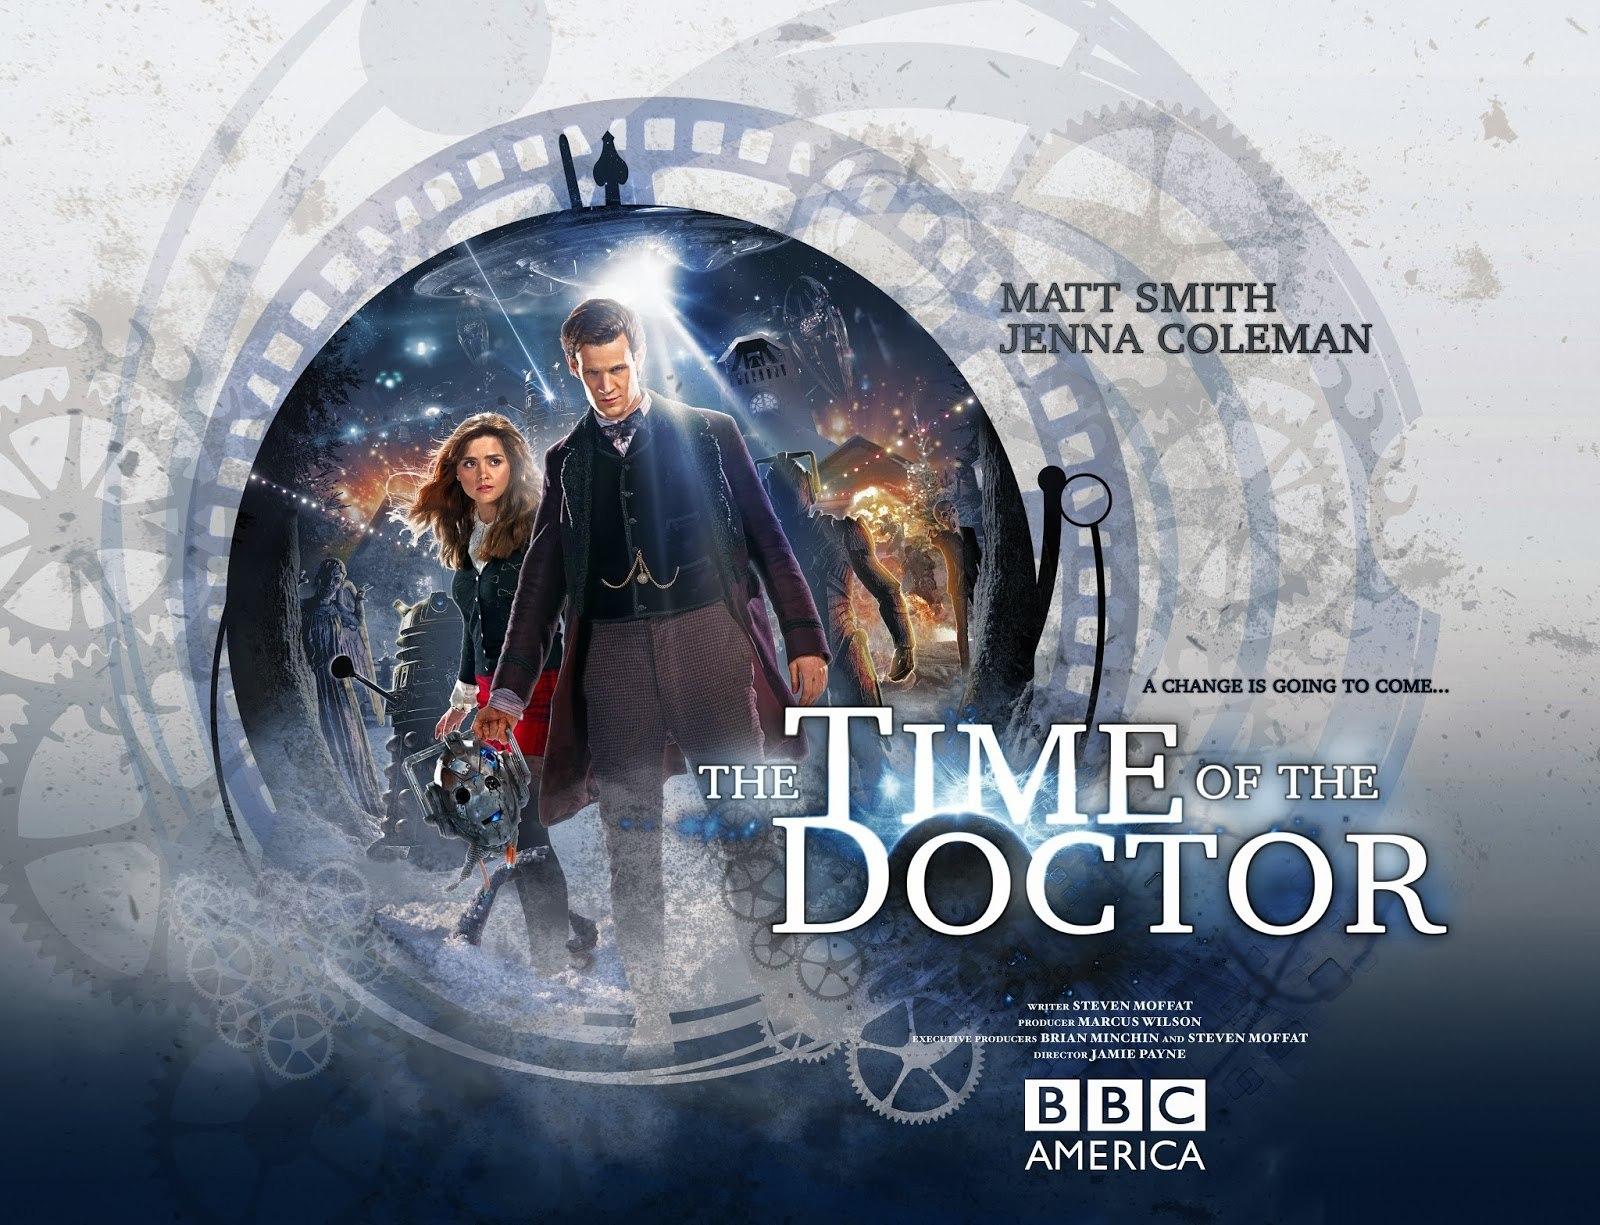 смотреть онлайн доктор хаус 3 сезон серия 3 сезон